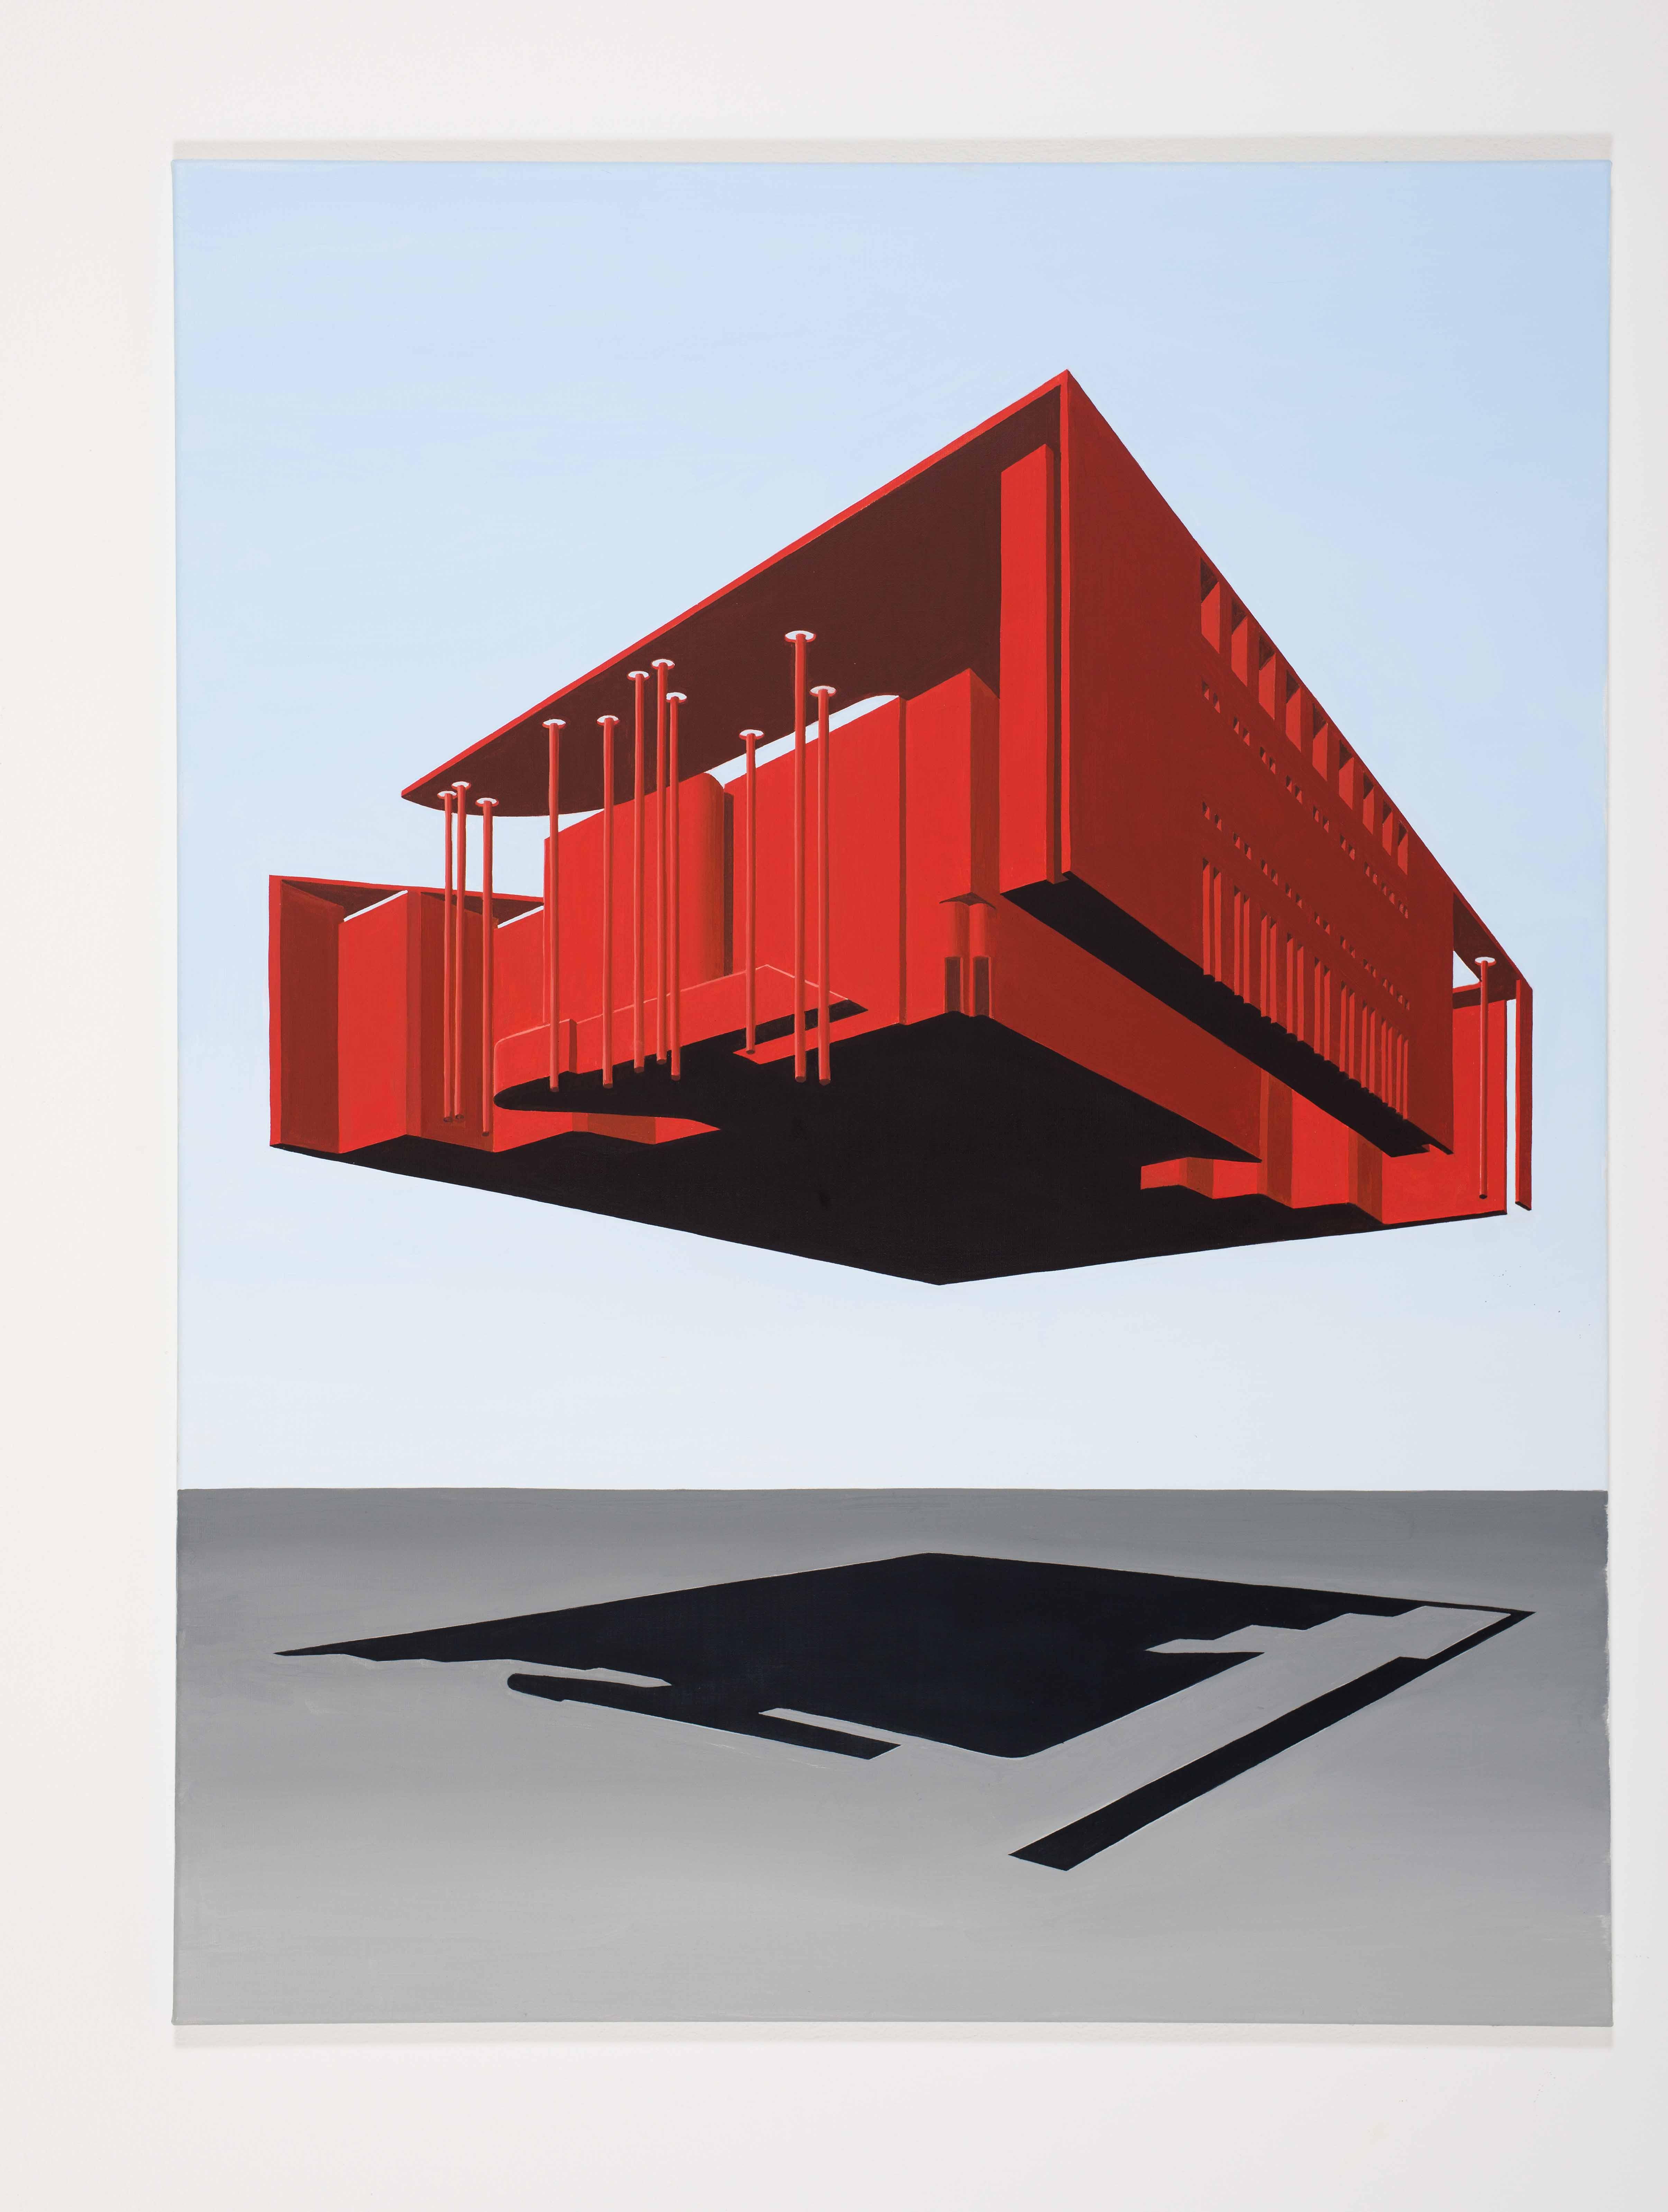 Thomas Huber: Am Horizont II, 2016, Öl auf Leinwand. 130 x 110 cm. Foto: Winfried Mateyka, Berlin. Copyright VG Bild-Kunst, Bonn 2016.